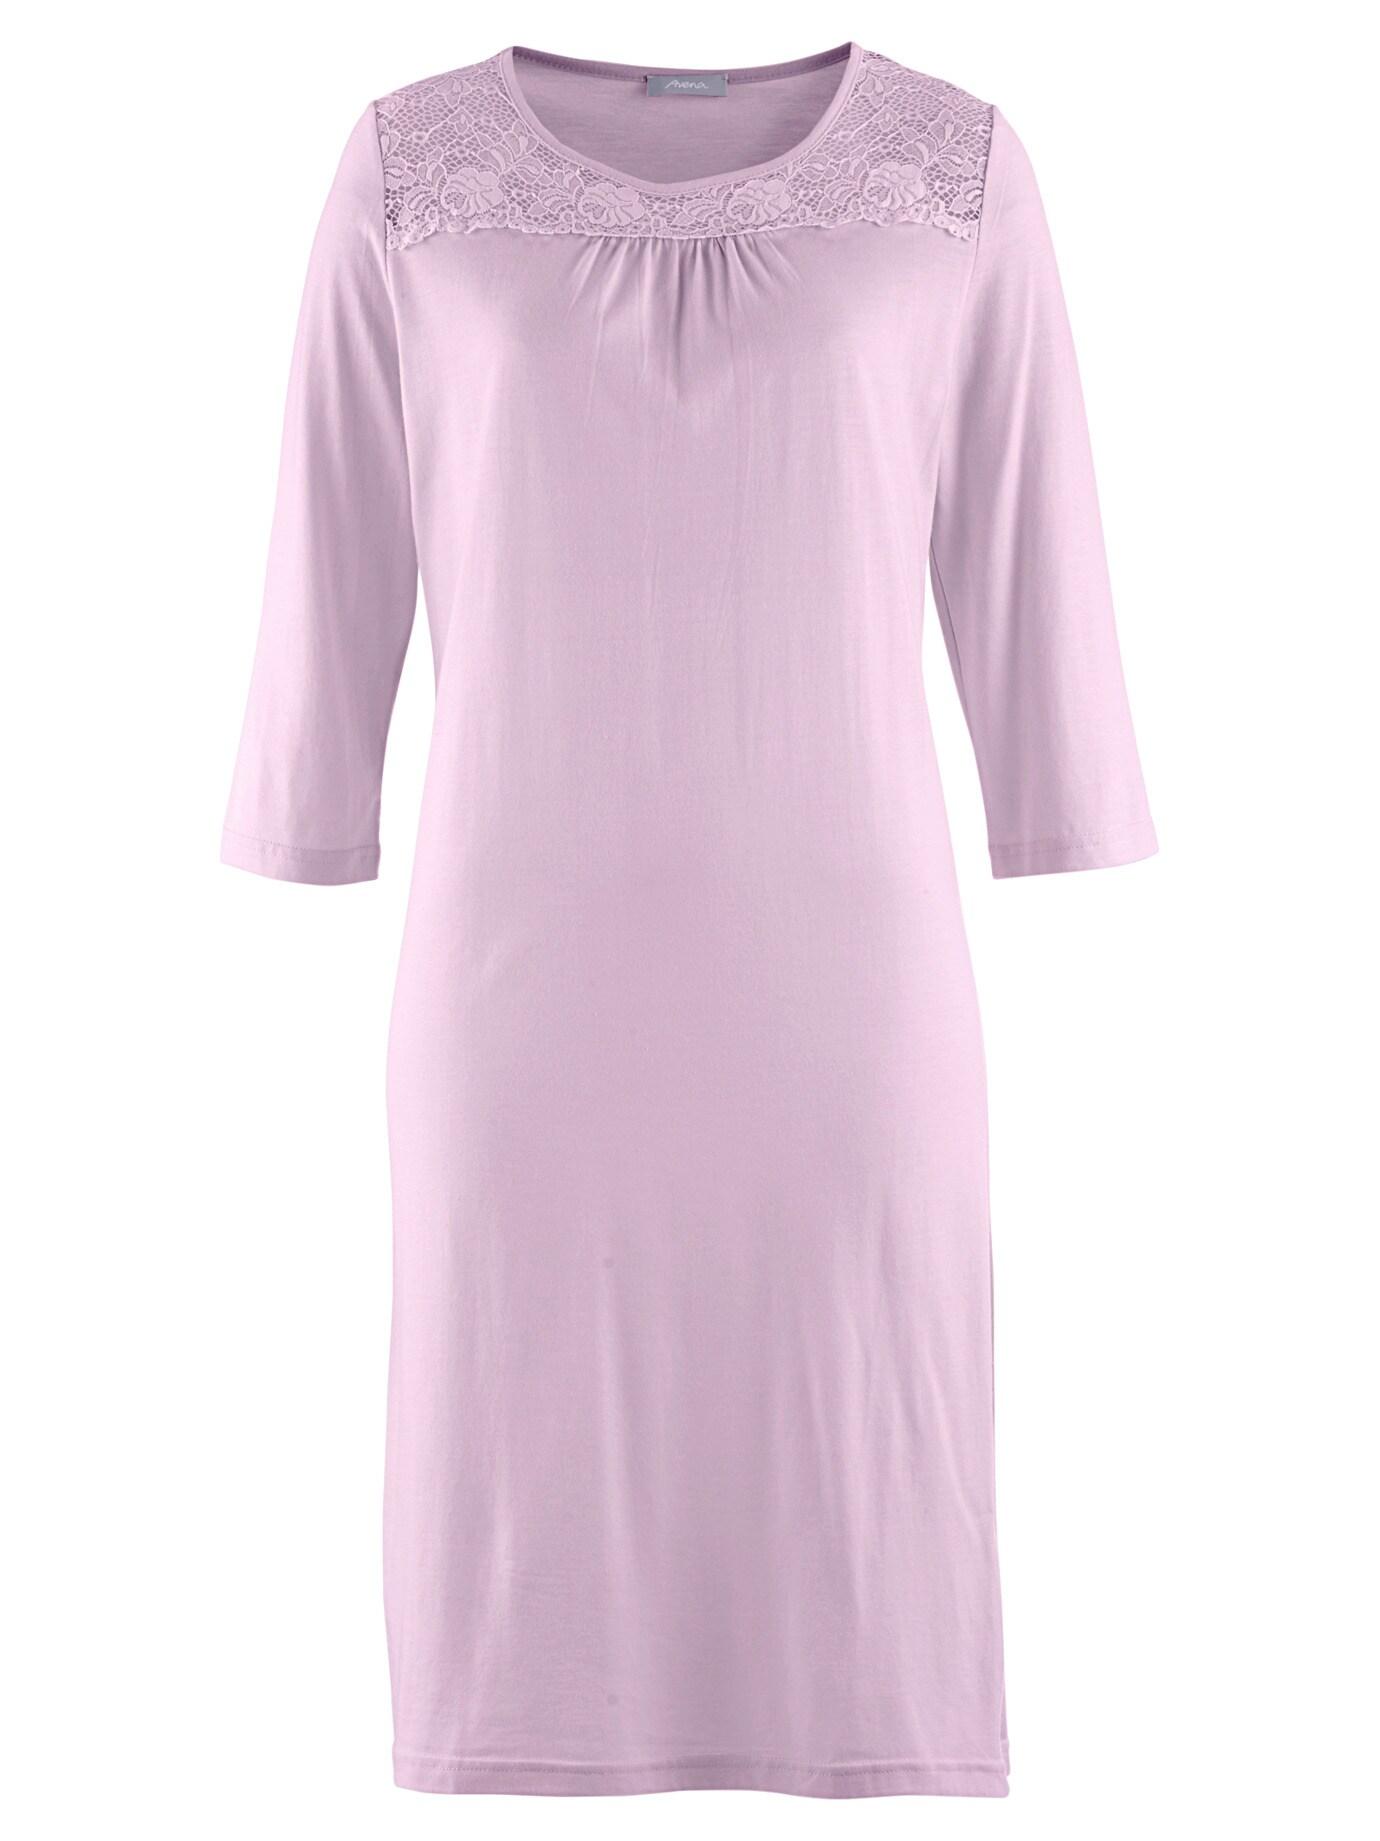 Avena Damen Nachthemd Spitzen-Detail Rose 42-9160-8